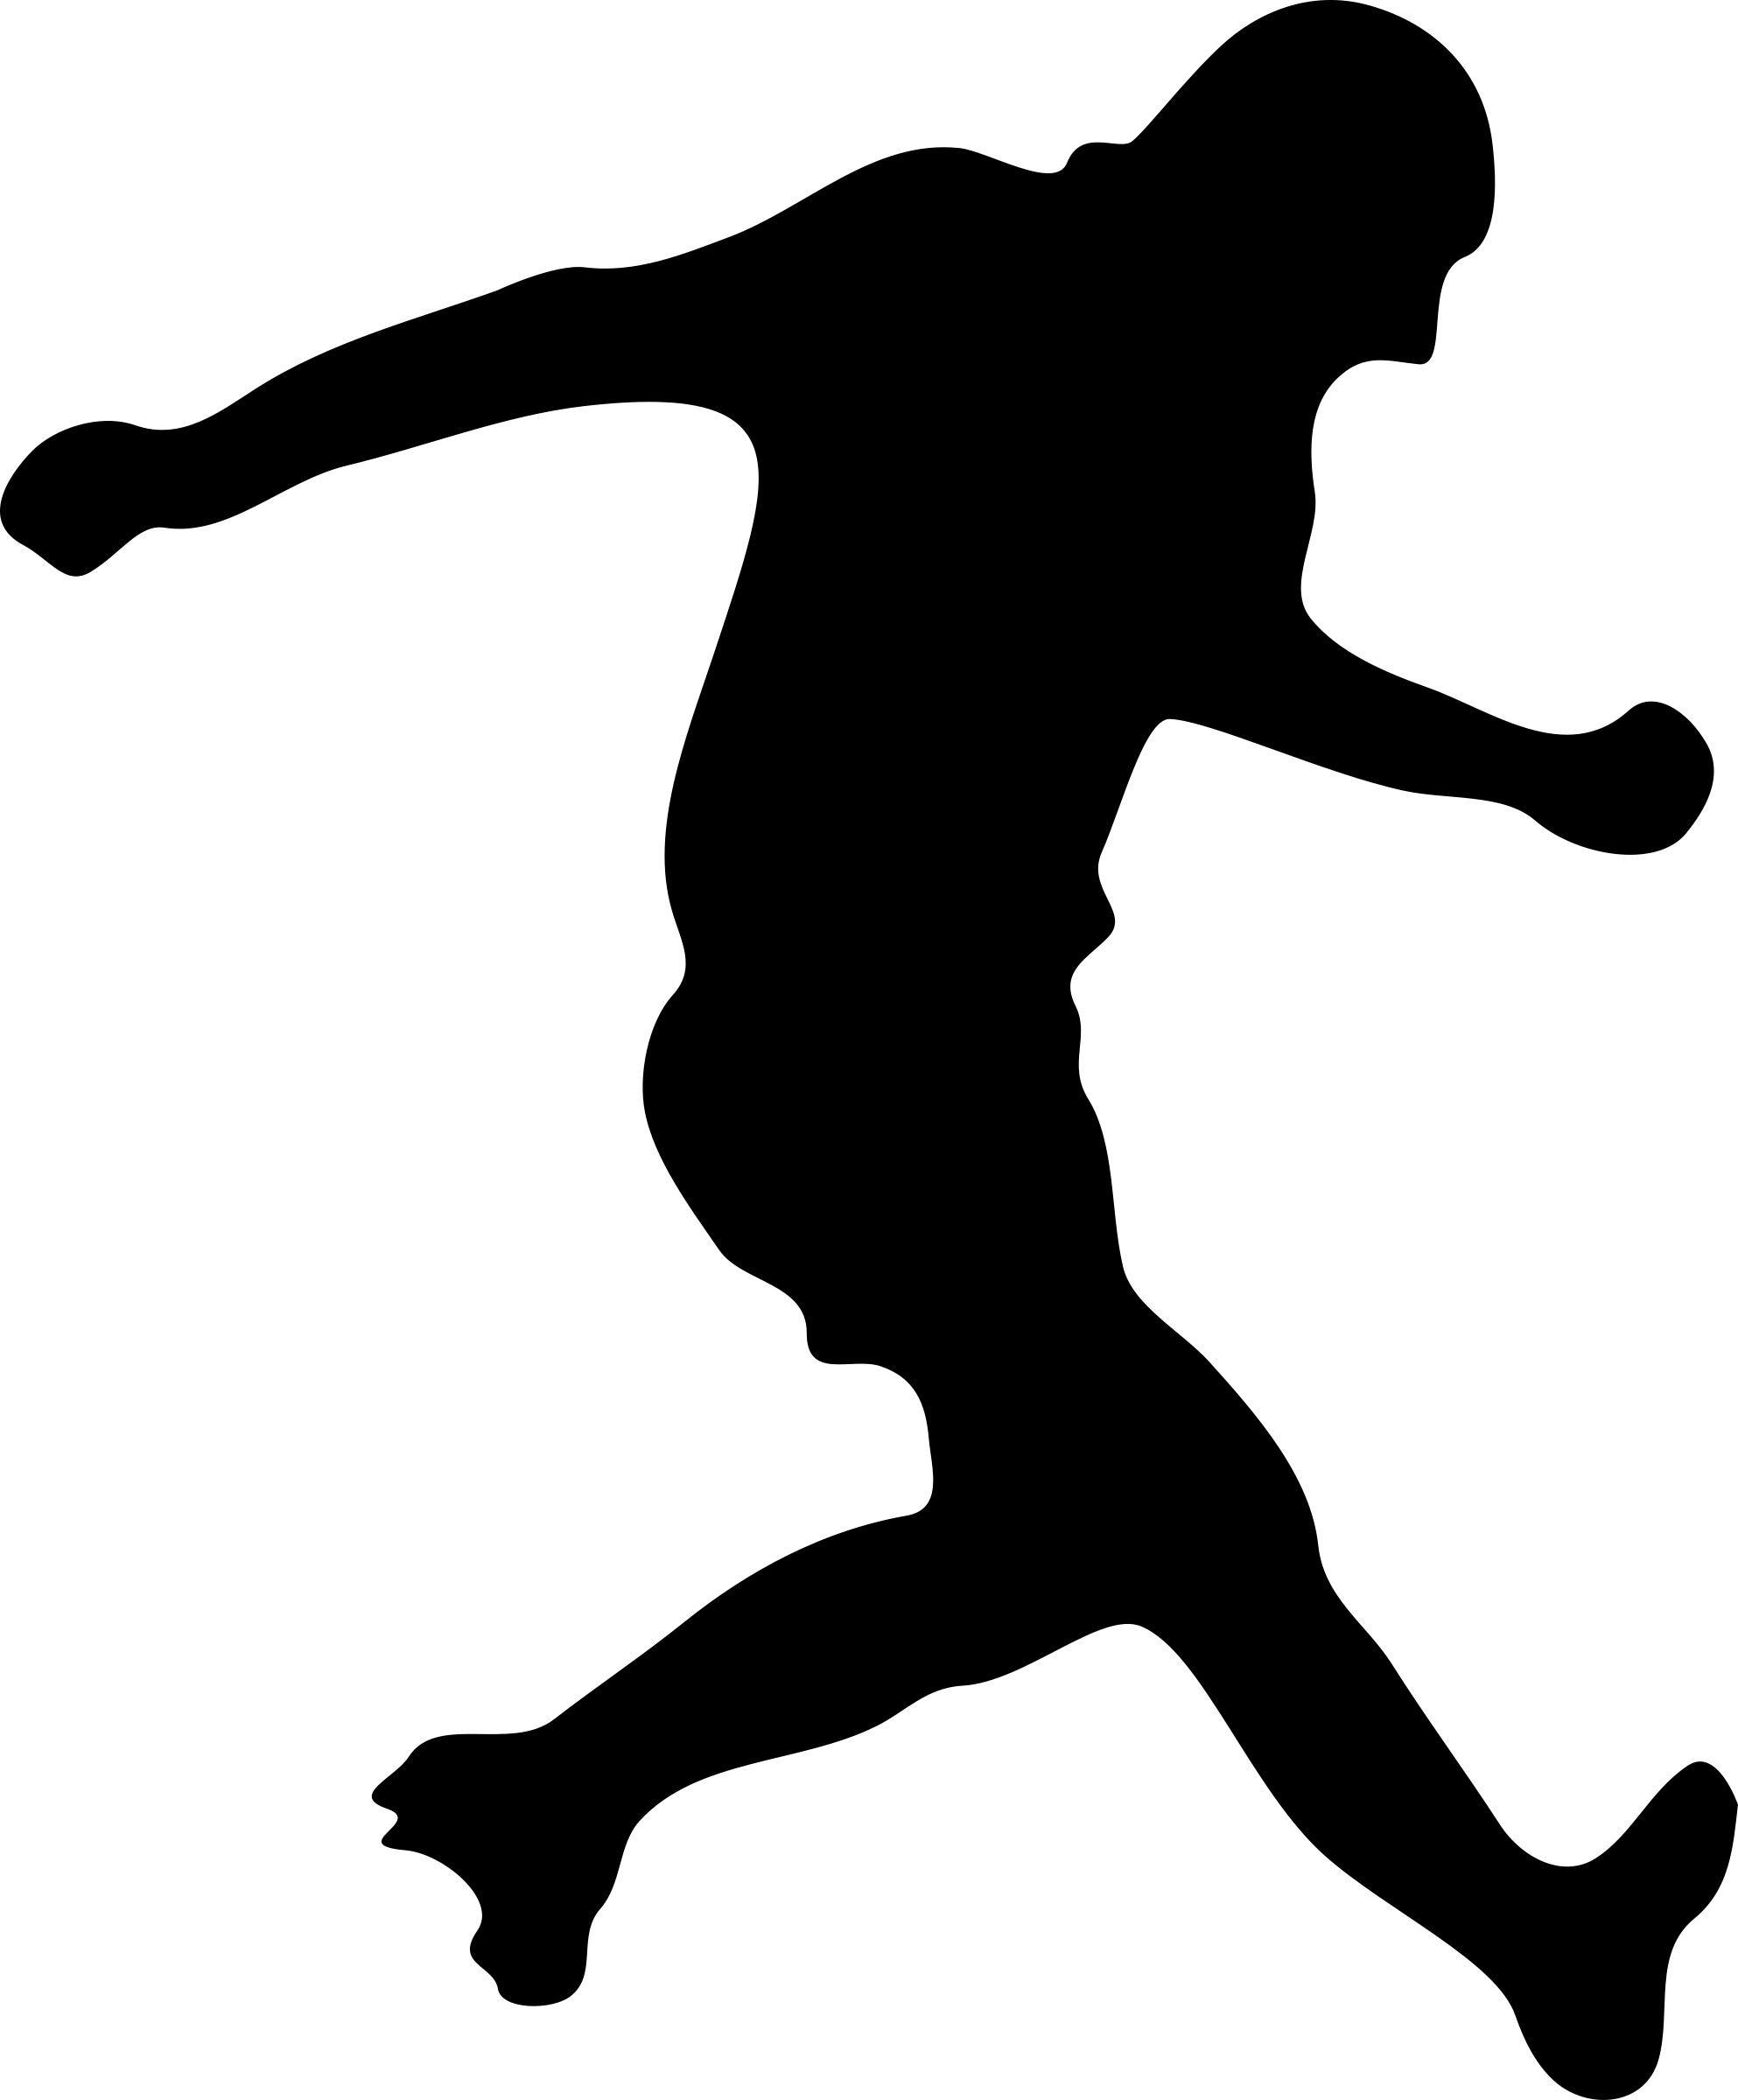 1986x2400 Soccer Goalie Silhouette Clipart Panda Use Case Notations Fender